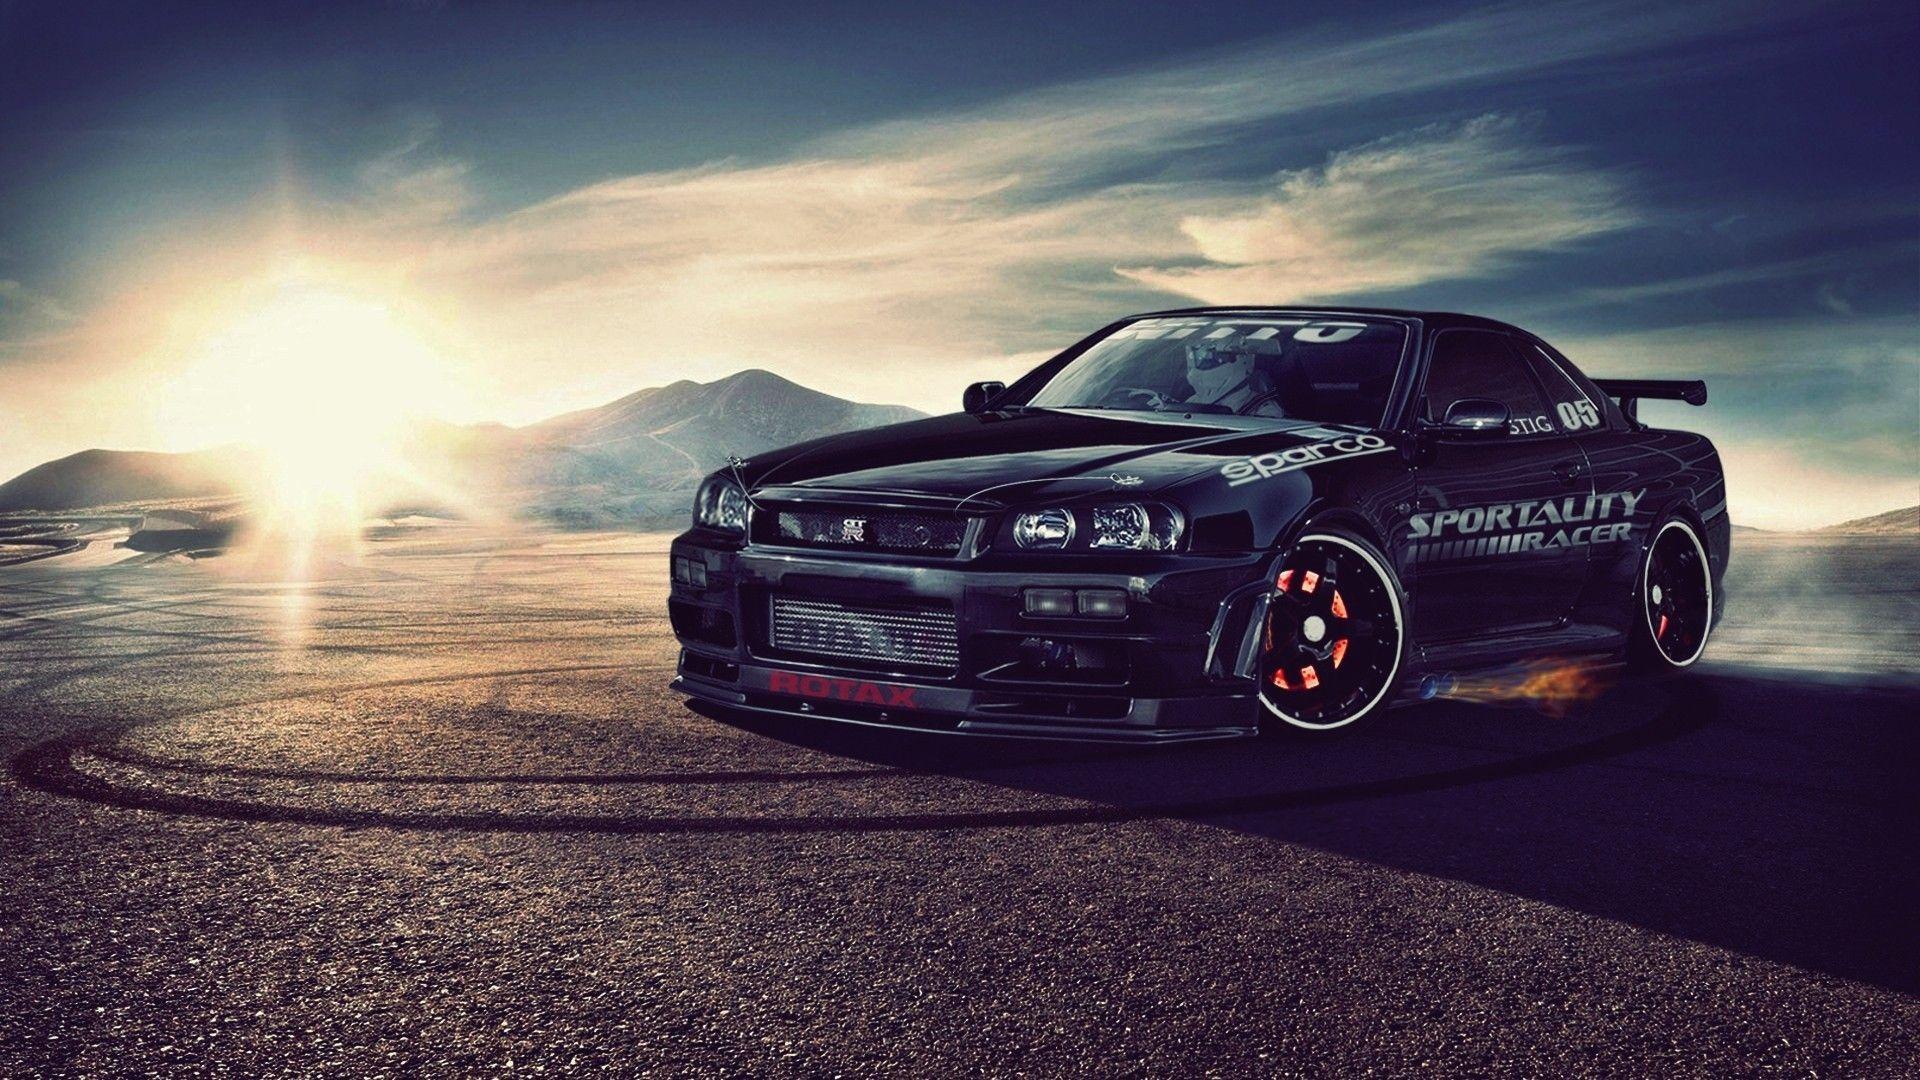 Tokyo Drift Cars Wallpapers Top Free Tokyo Drift Cars Backgrounds